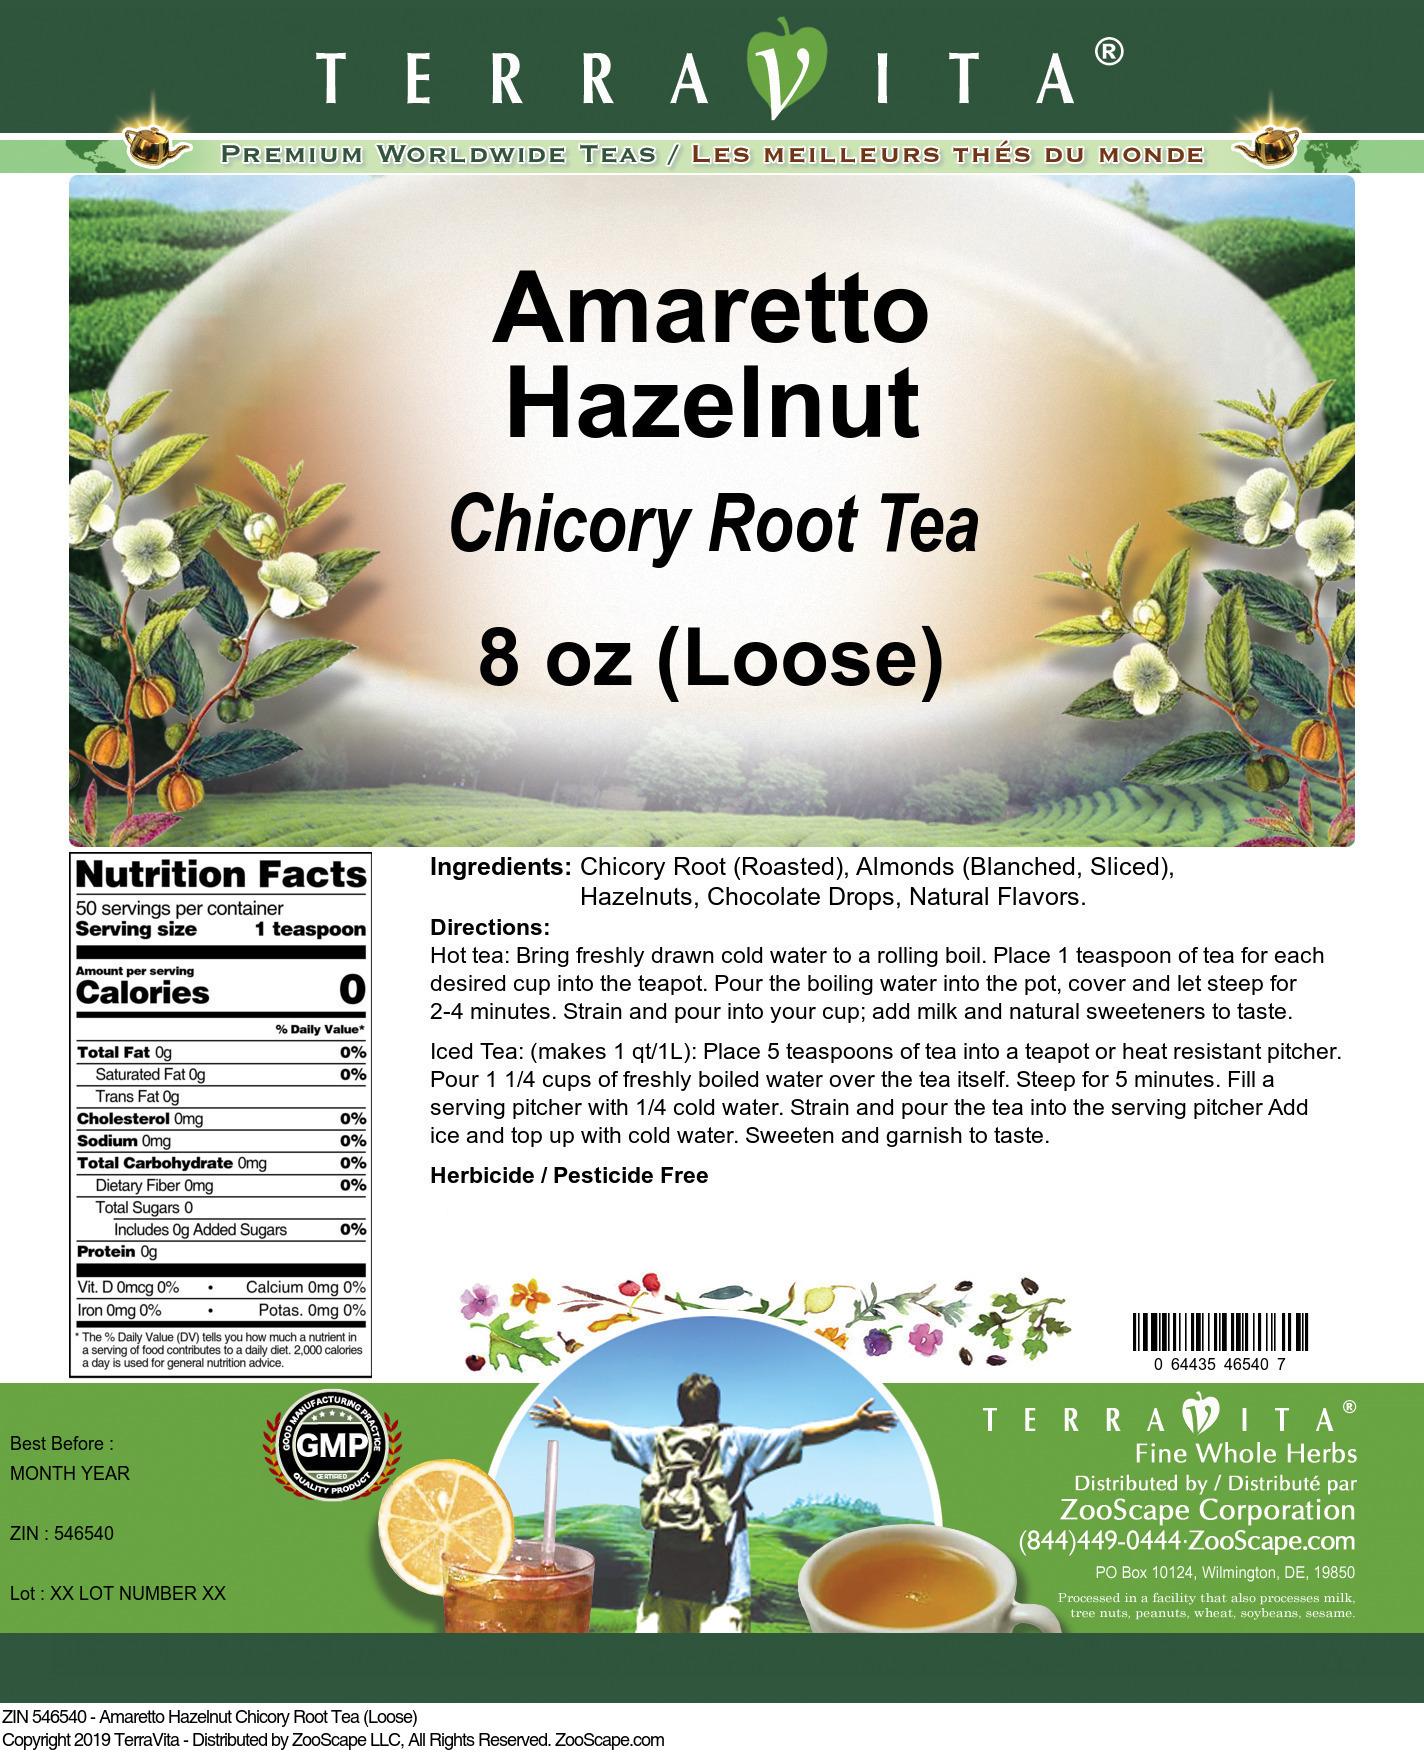 Amaretto Hazelnut Chicory Root Tea (Loose)